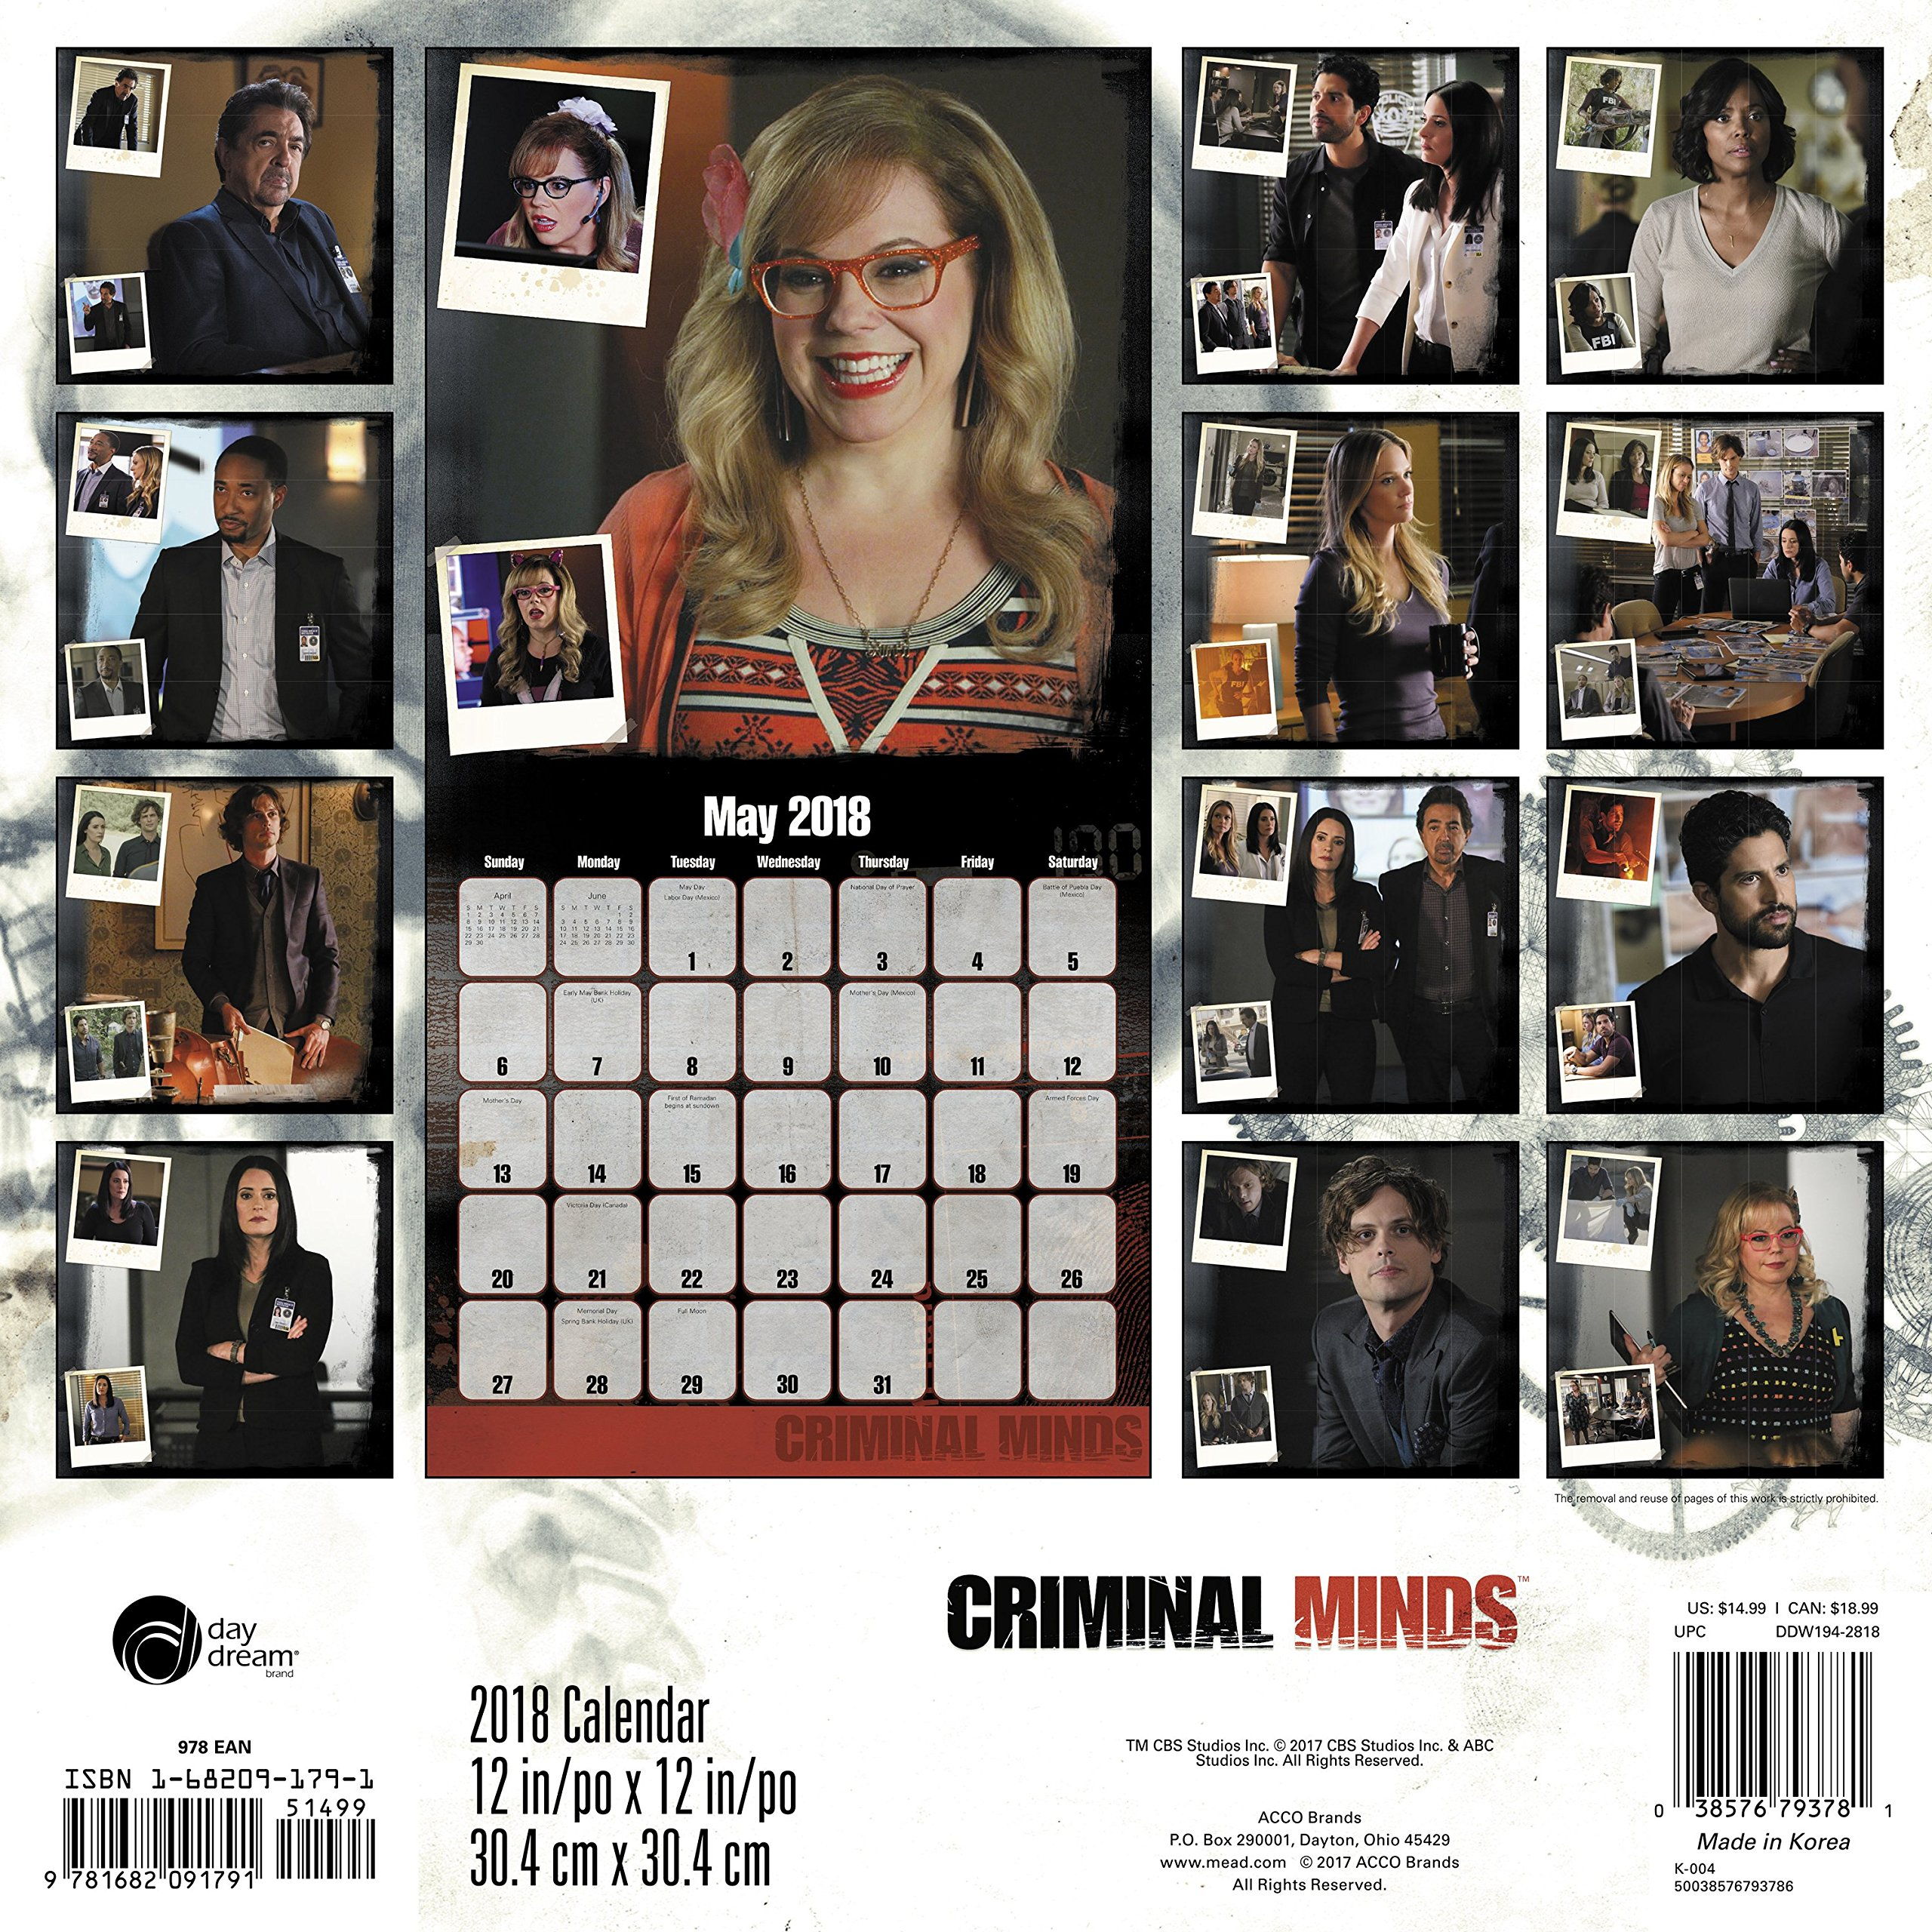 Amazon 2018 criminal minds wall calendar day dream amazon 2018 criminal minds wall calendar day dream 0038576793781 day dream books m4hsunfo